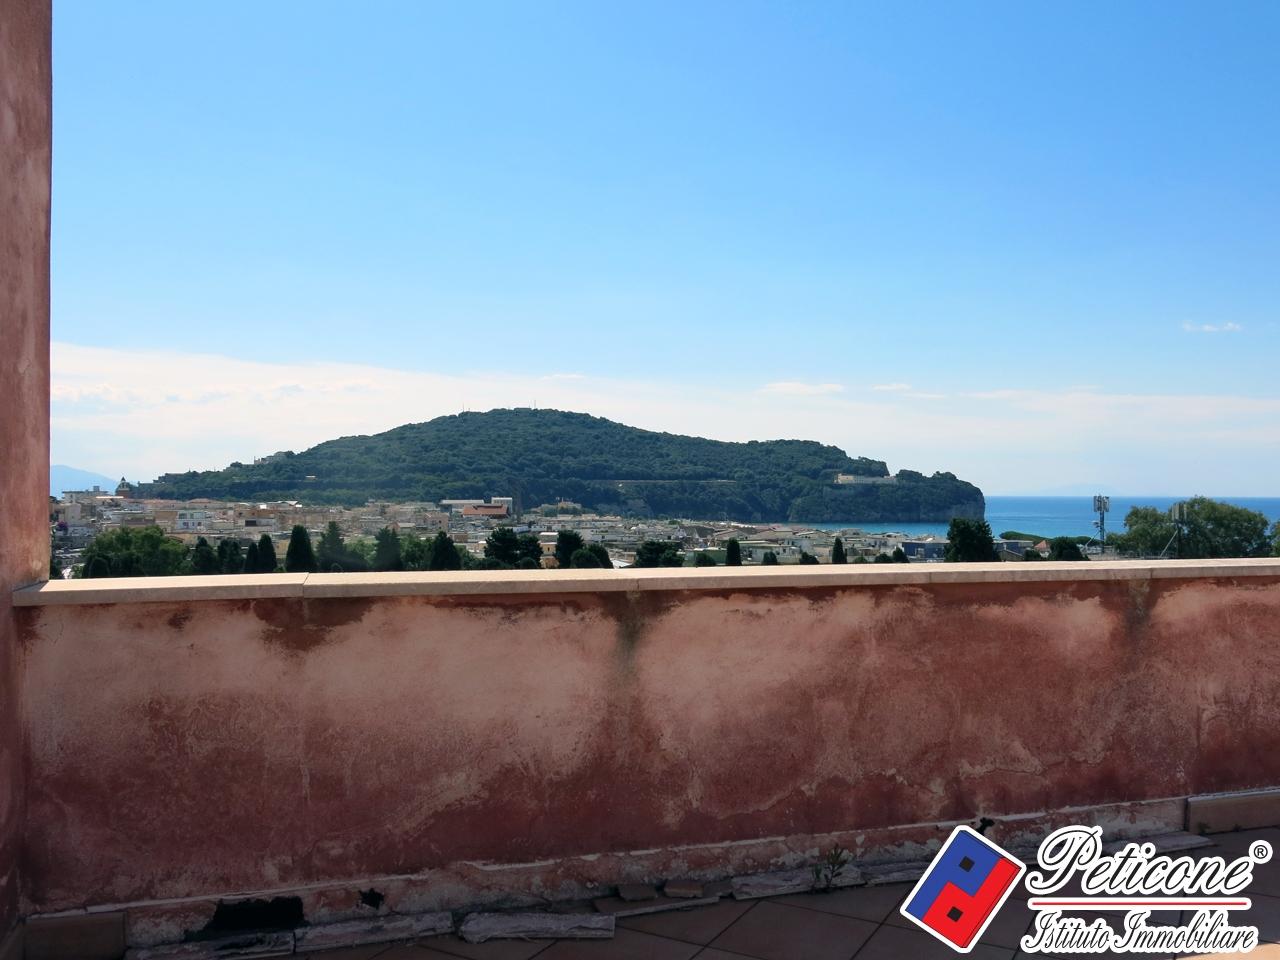 Villa in Vendita a Gaeta: 5 locali, 250 mq - Foto 18